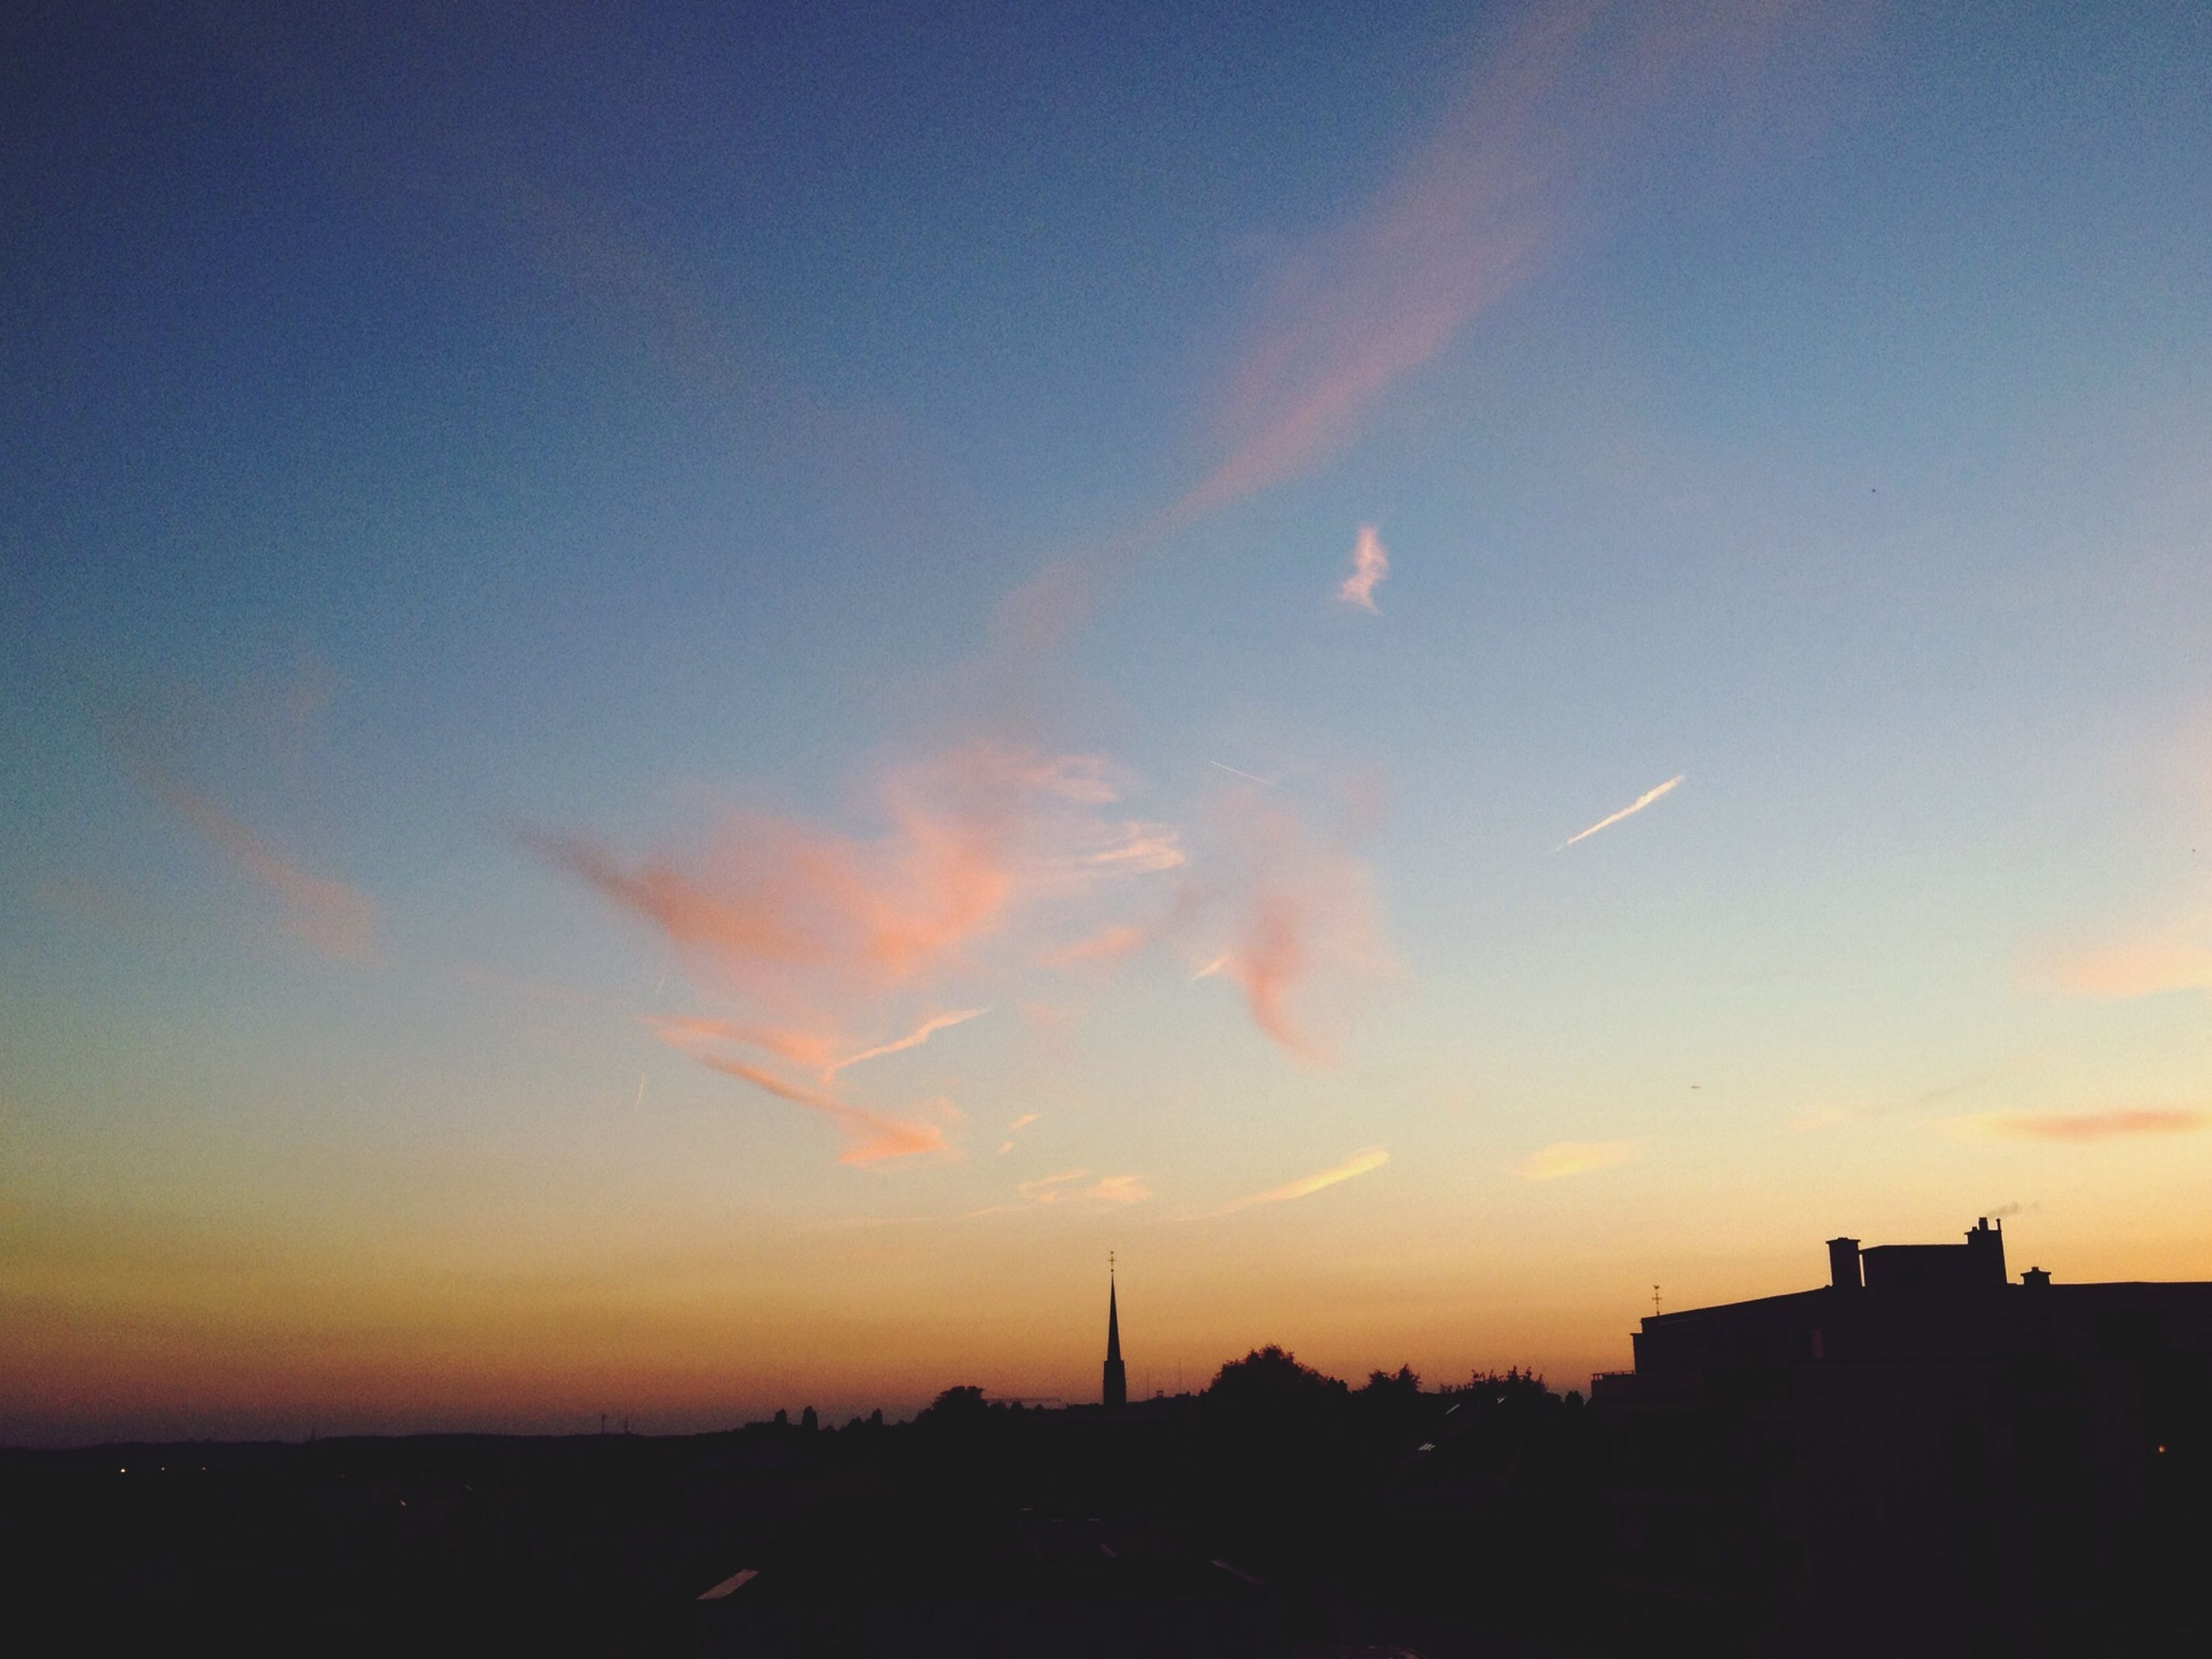 sunset, silhouette, building exterior, orange color, sky, scenics, built structure, beauty in nature, architecture, nature, city, dusk, tranquility, tranquil scene, landscape, idyllic, cityscape, outdoors, copy space, dark